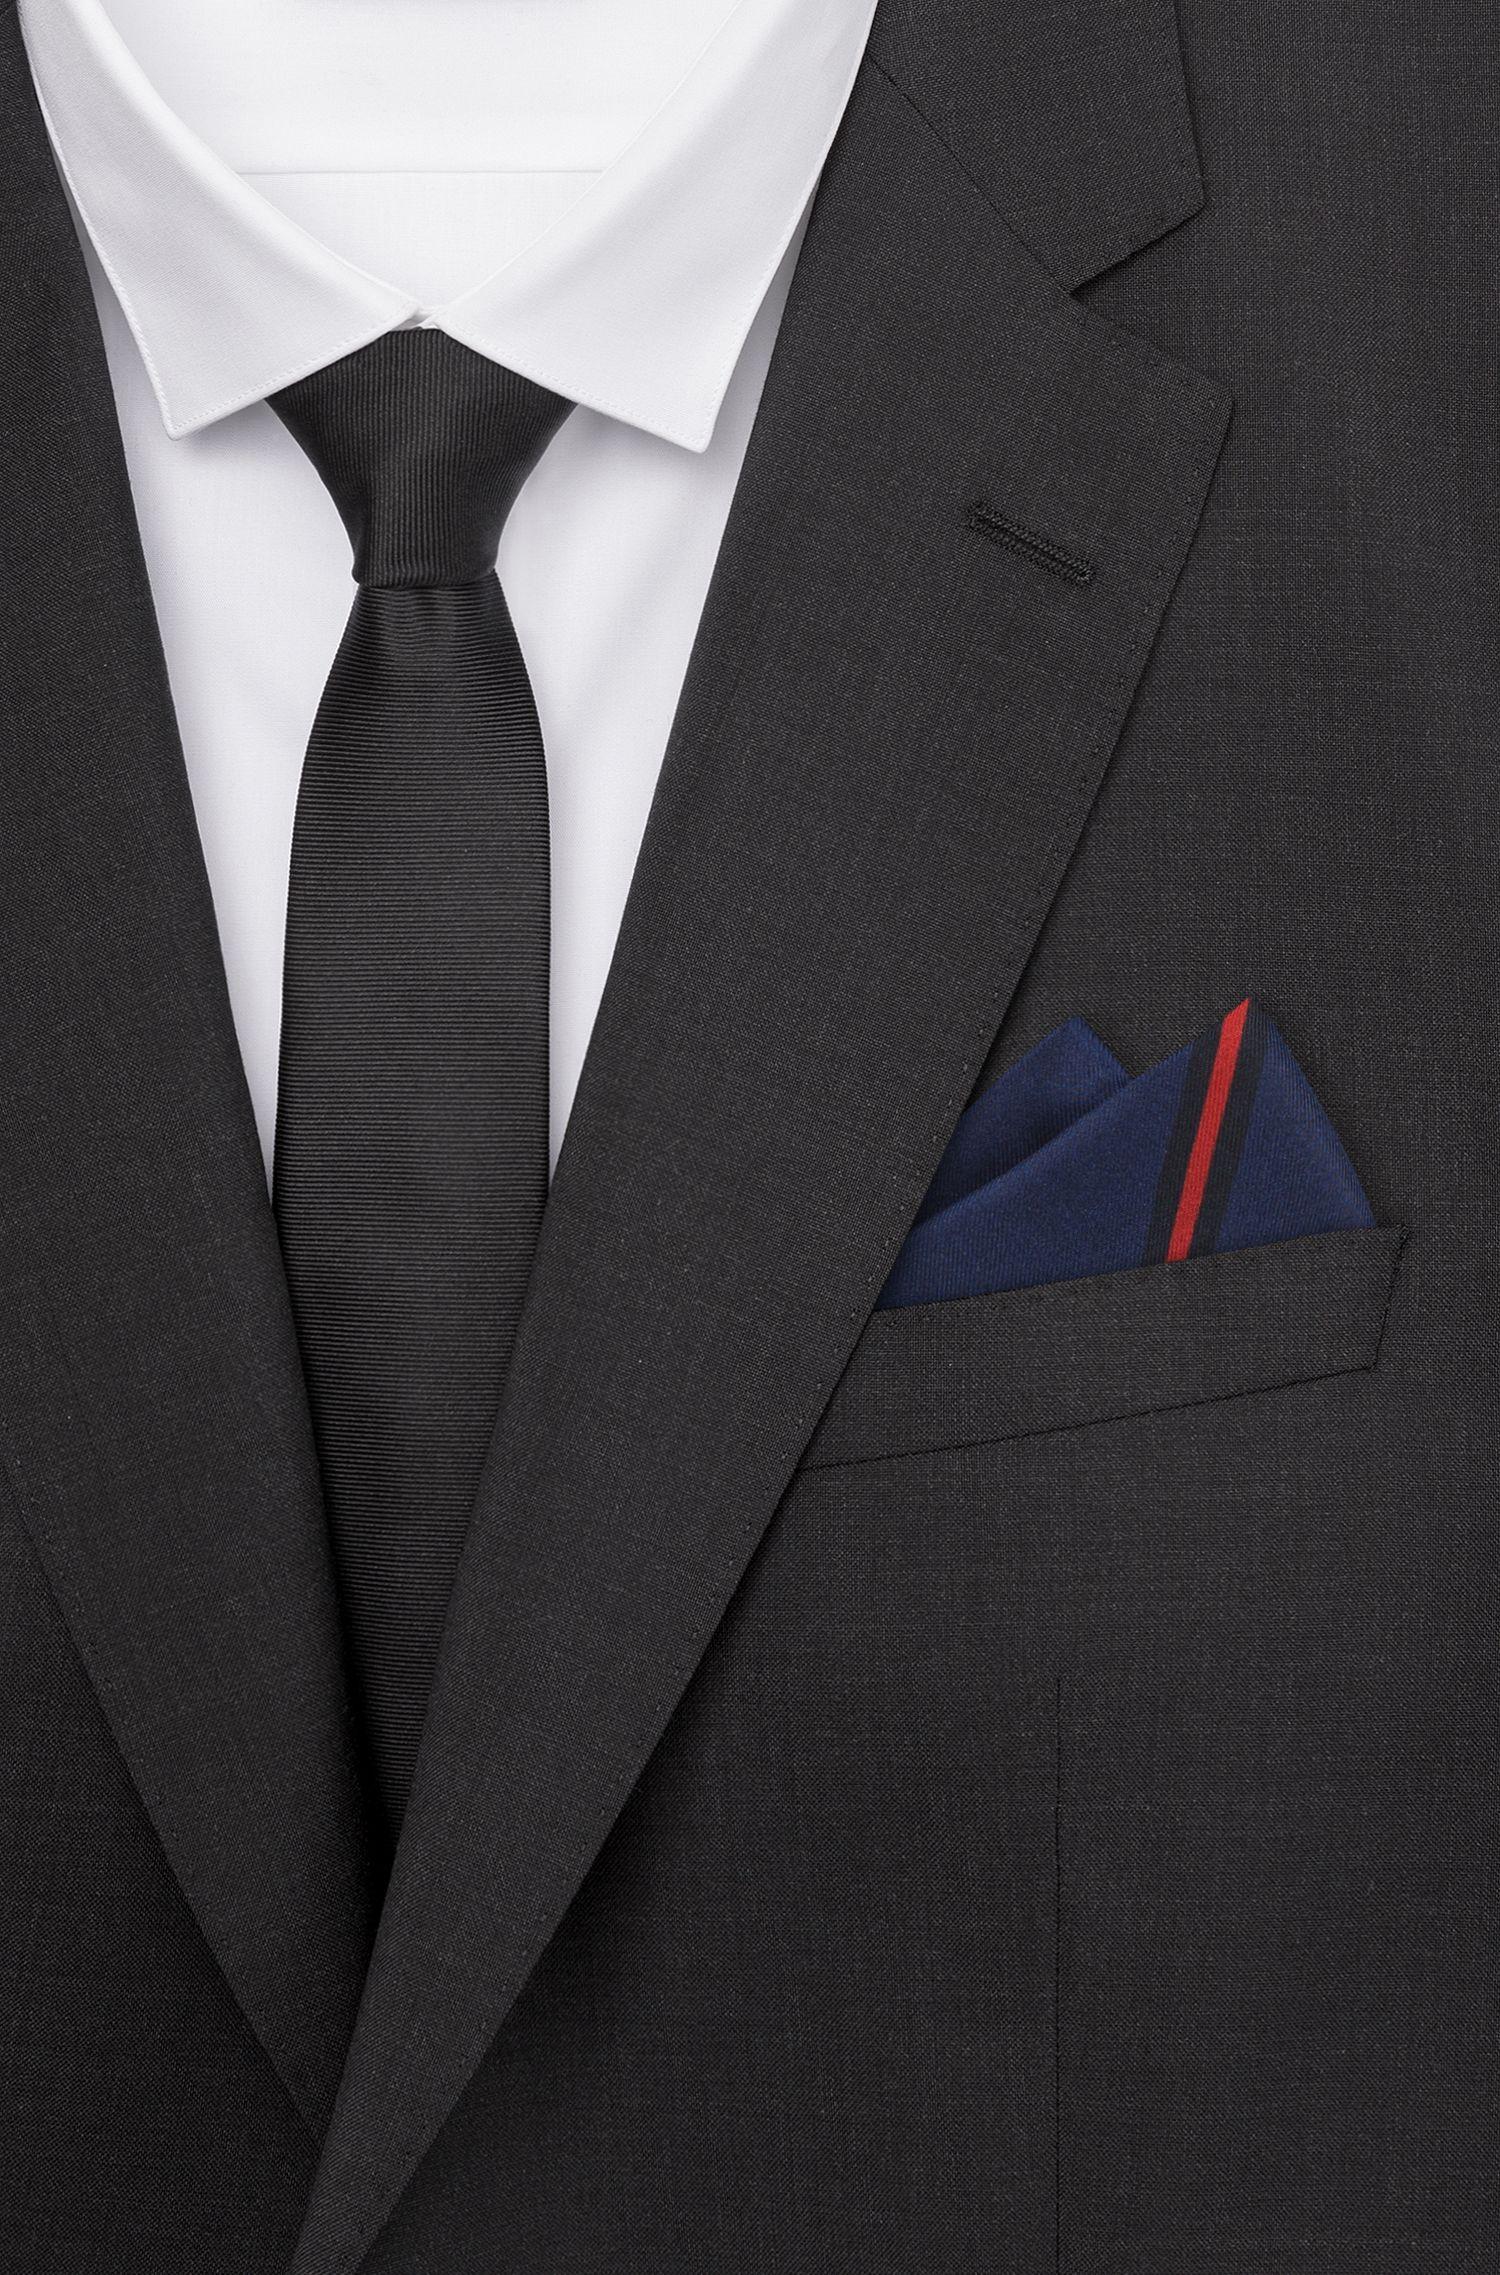 Hugo Boss - Pañuelo de bolsillo en sarga de seda con estampado digital - 2